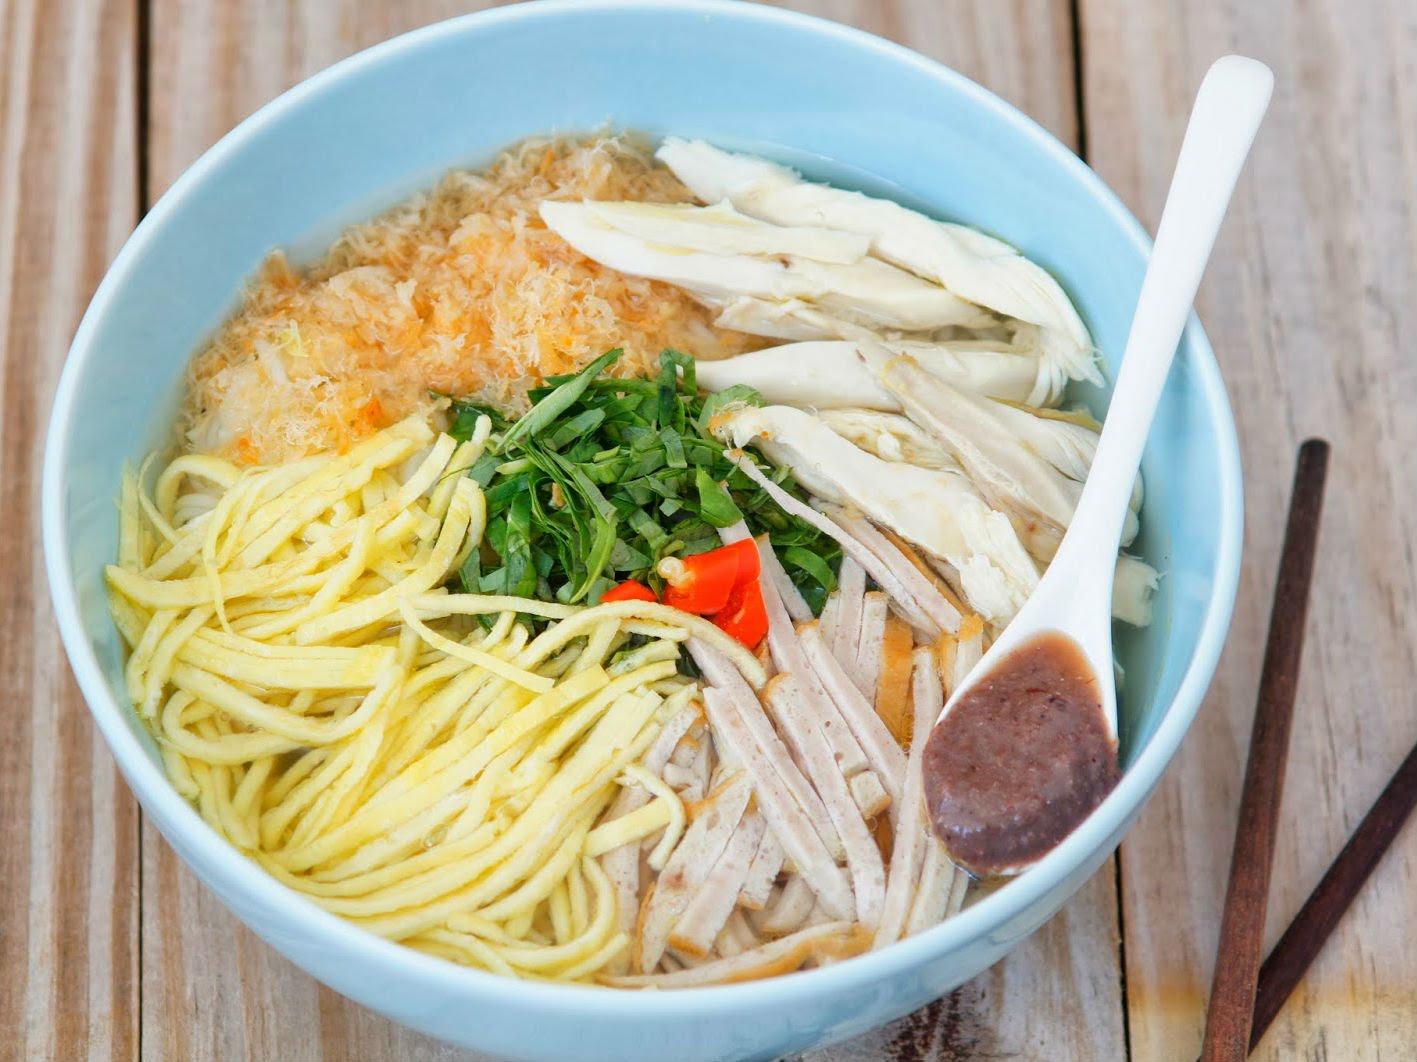 The-diversity-of-Hanoi-cuisine-3